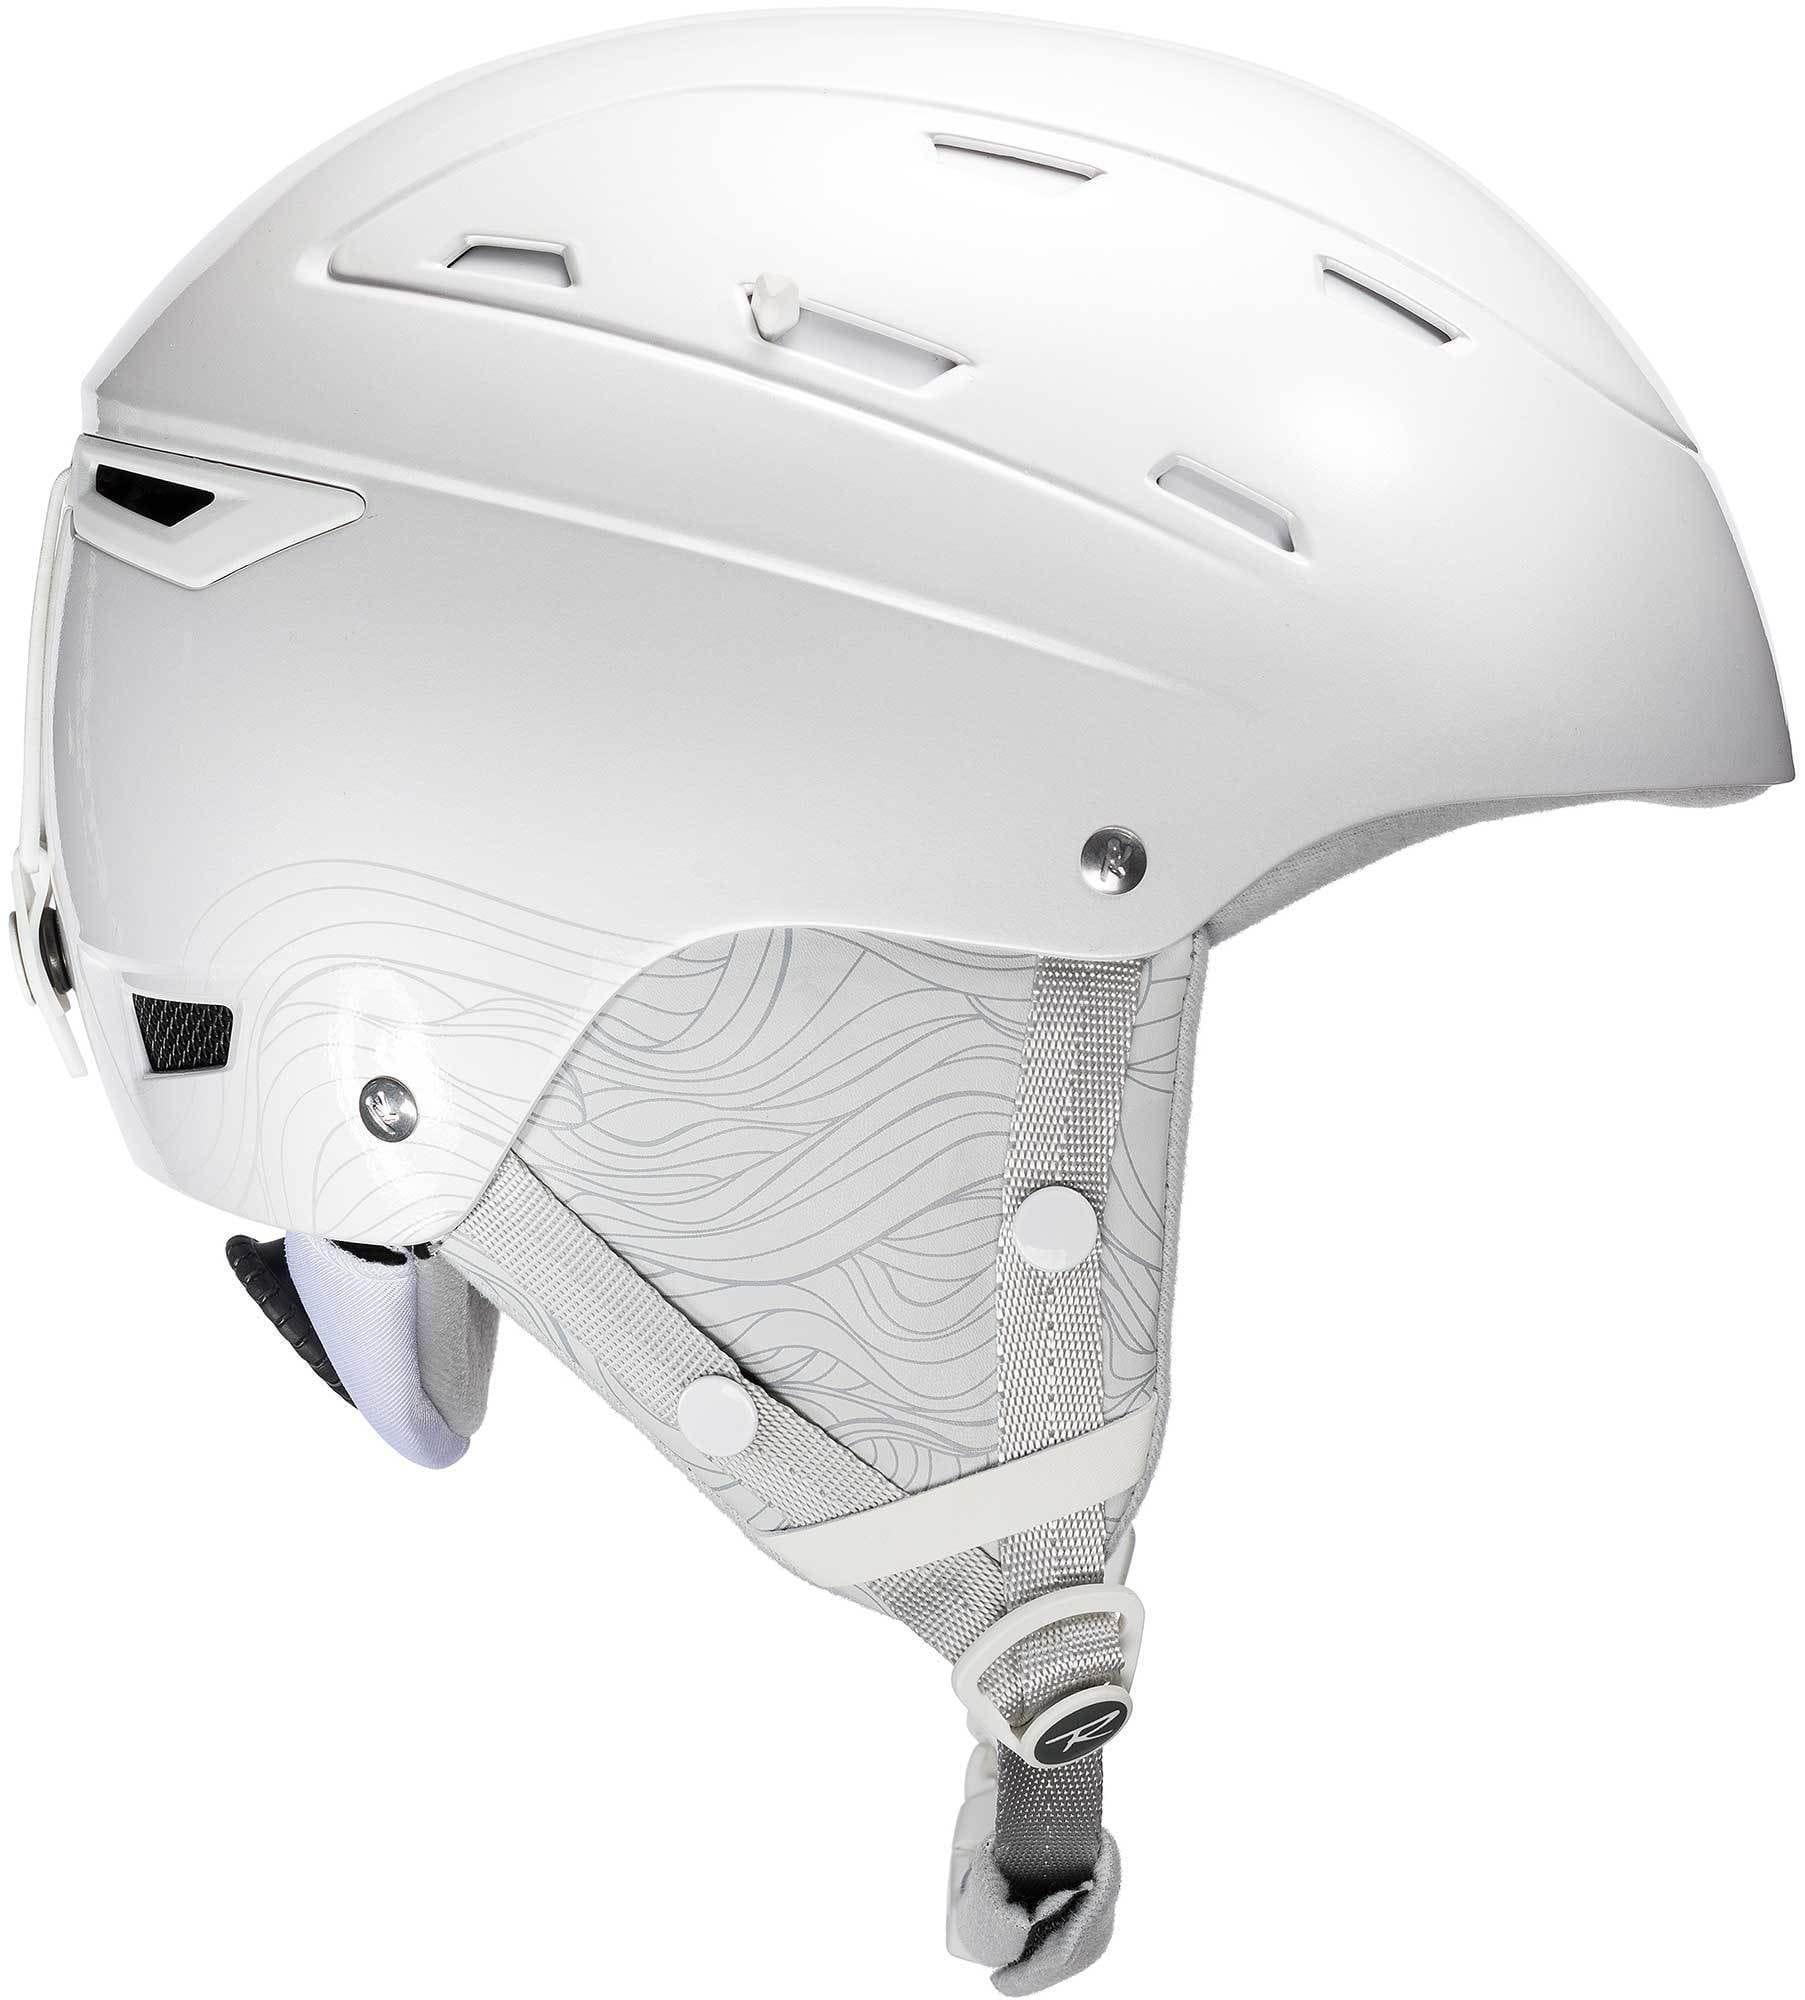 Kask narciarski damski Rossignol Reply Impacts White R: ML(55 58cm)